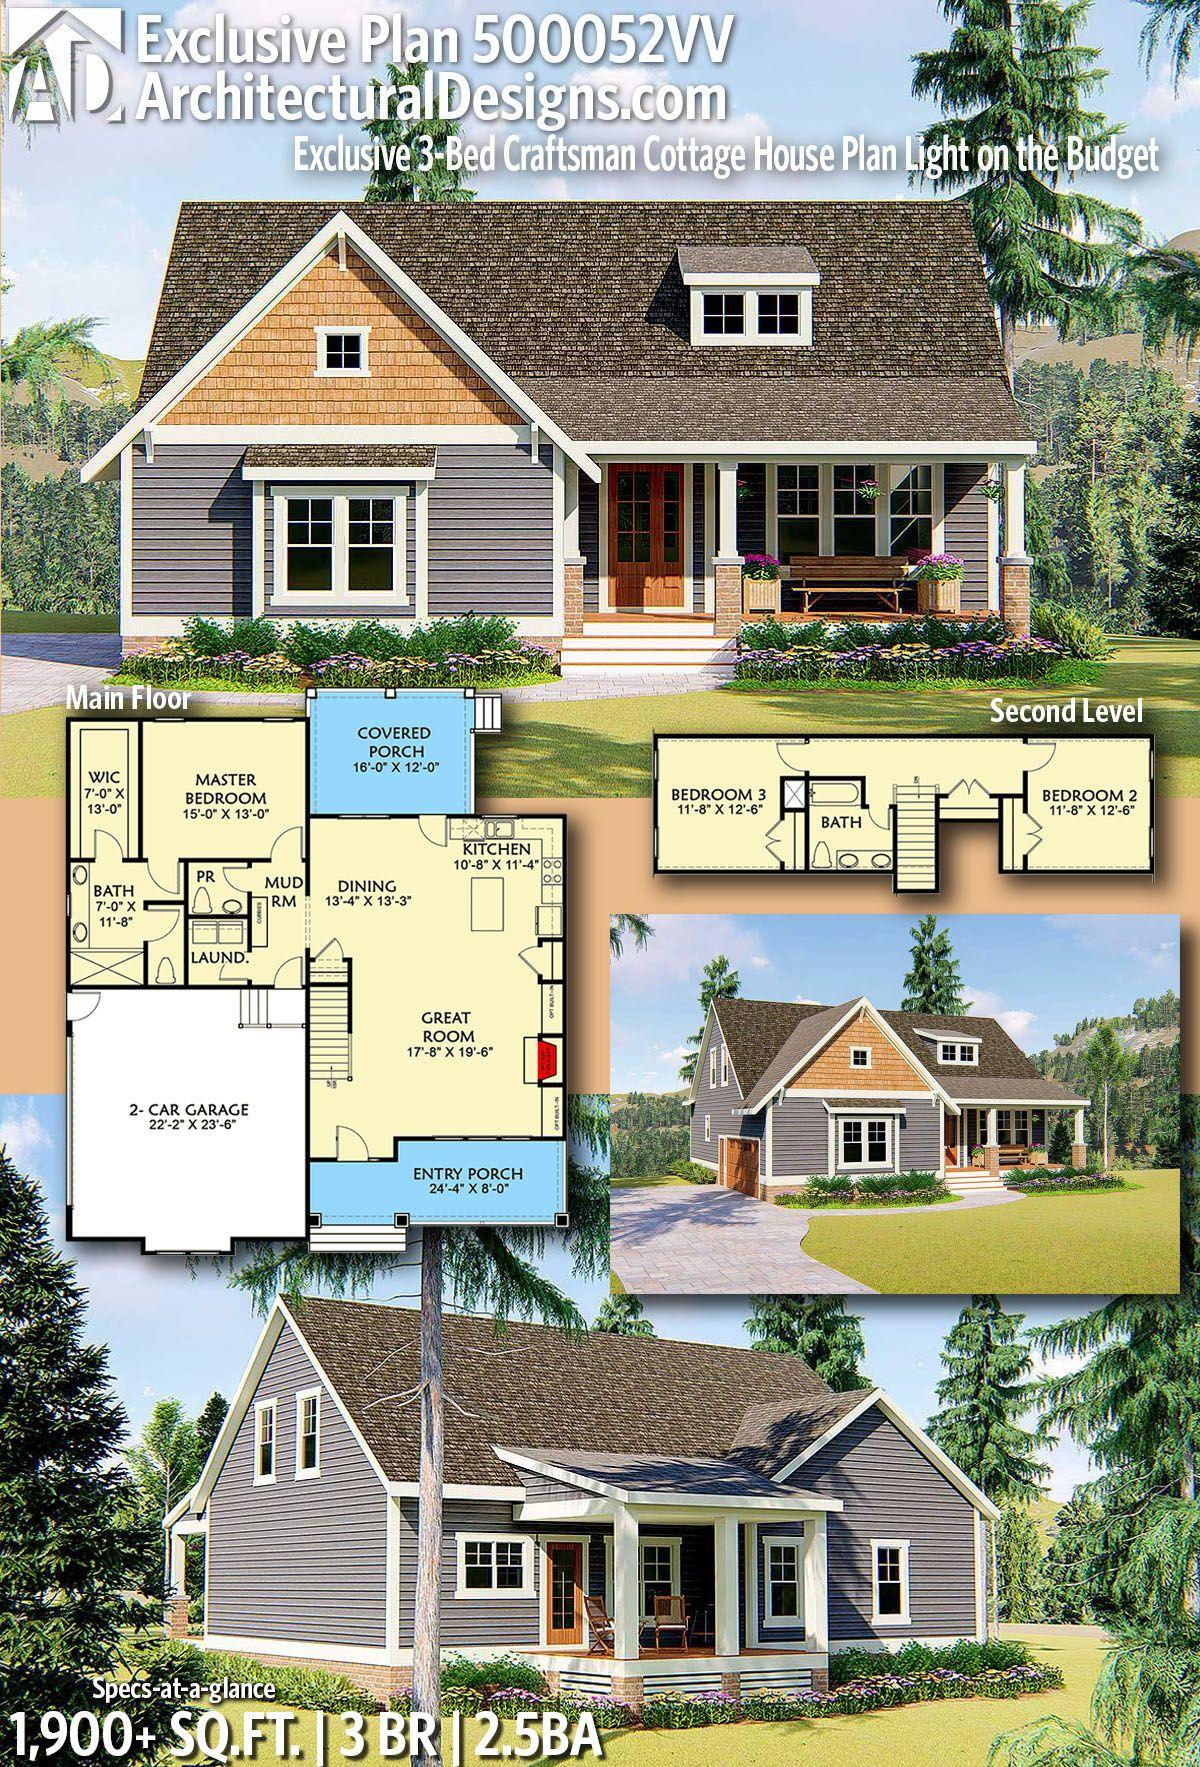 Plan 500052vv Exclusive 3 Bed Craftsman Cottage House Plan Light On The Budget In 2020 Cottage House Plans Craftsman House Plans New House Plans